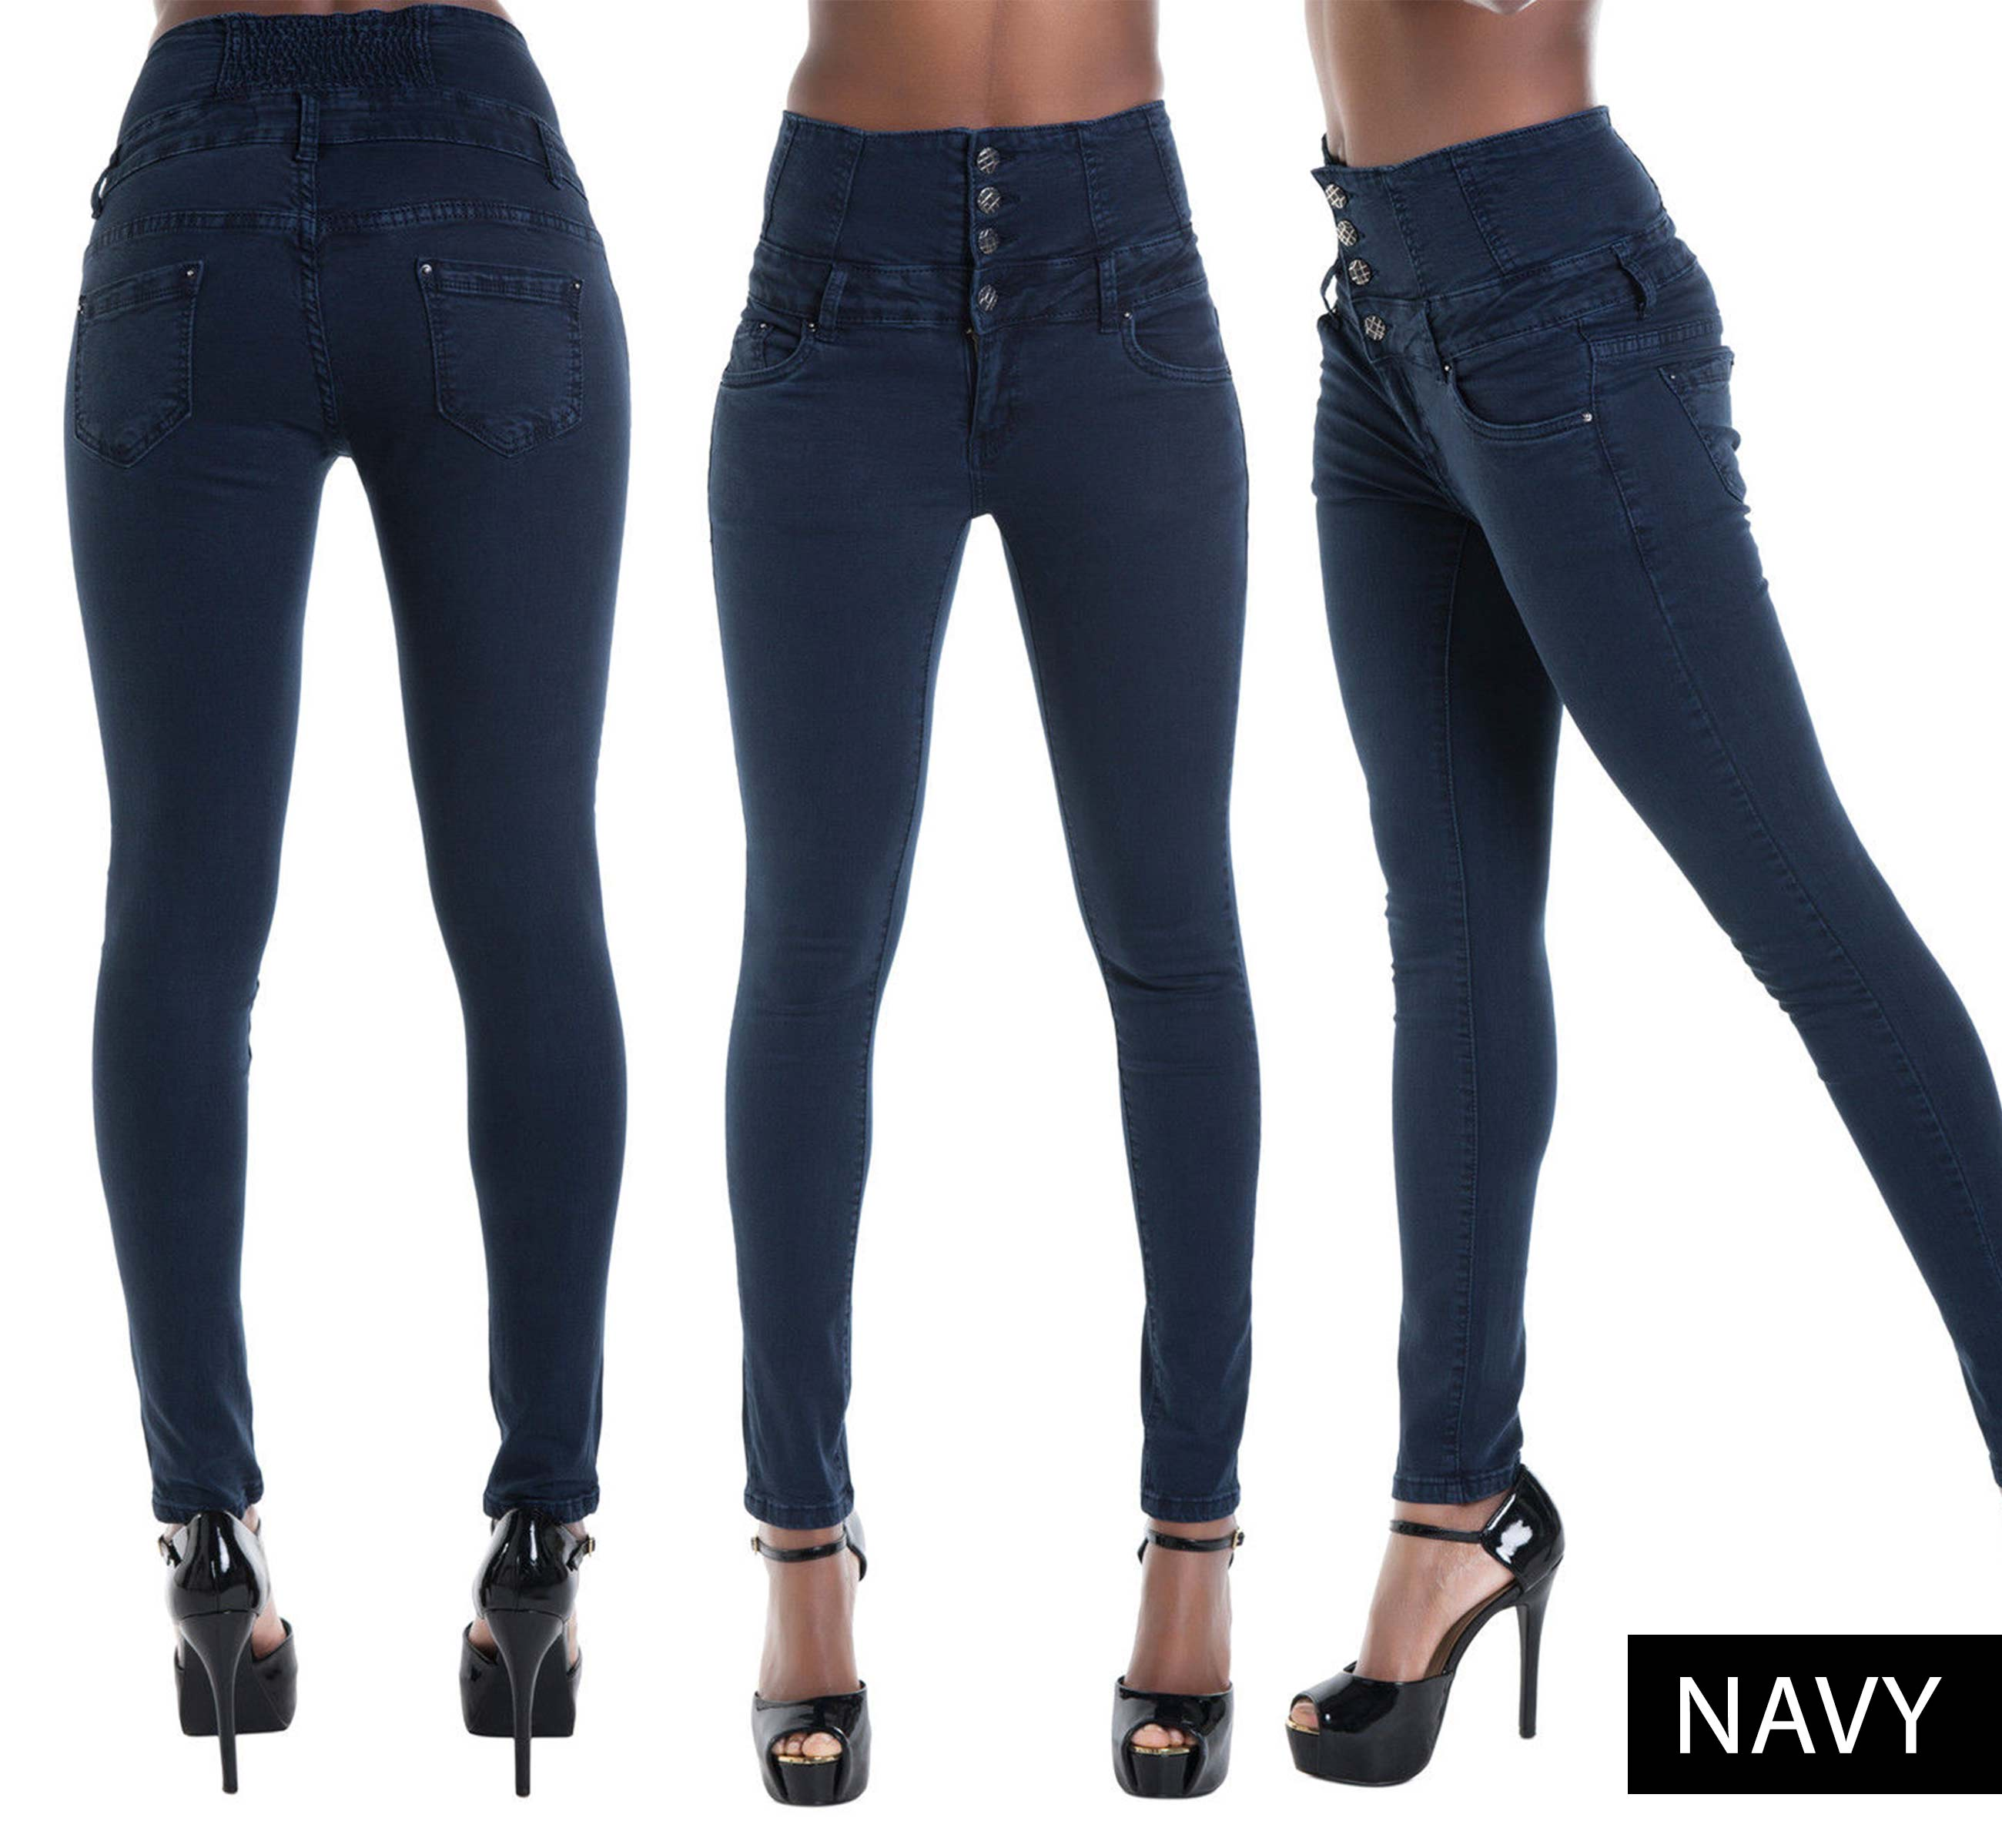 High waist denim skinny leg stretchy jeans size 6 8 10 12 14 ebay